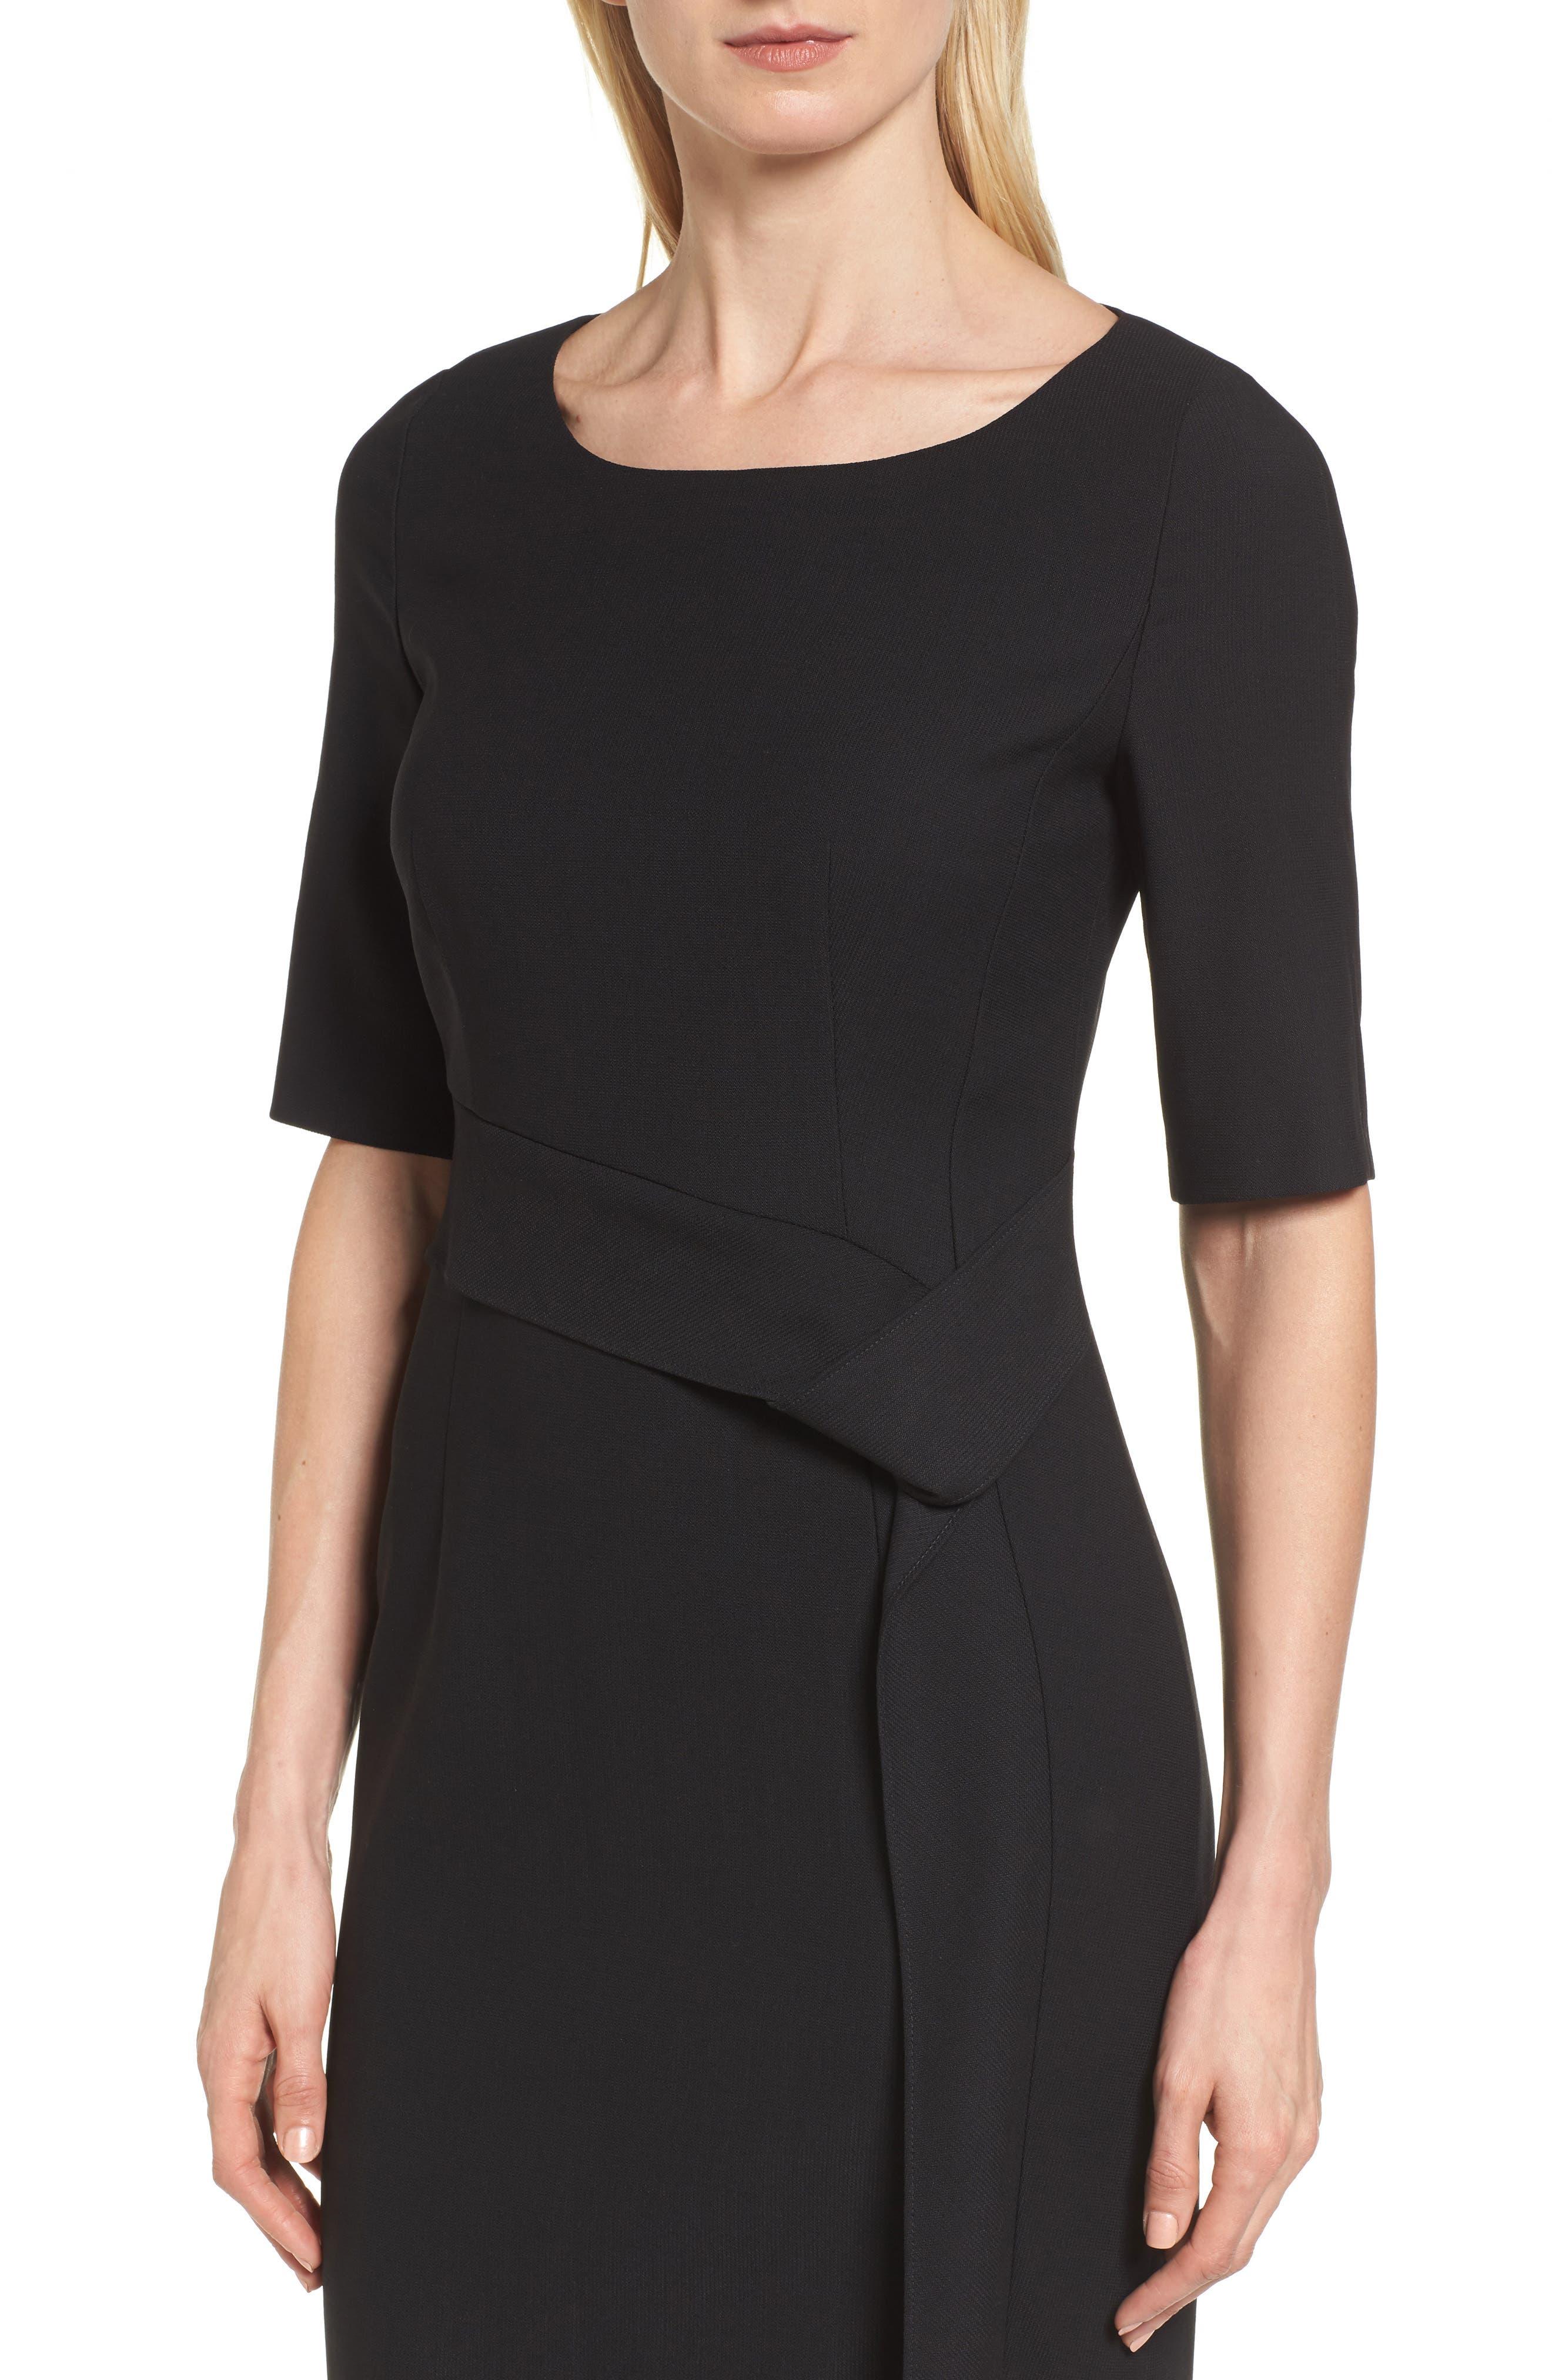 Delera Stretch Wool Sheath Dress,                             Alternate thumbnail 4, color,                             Black